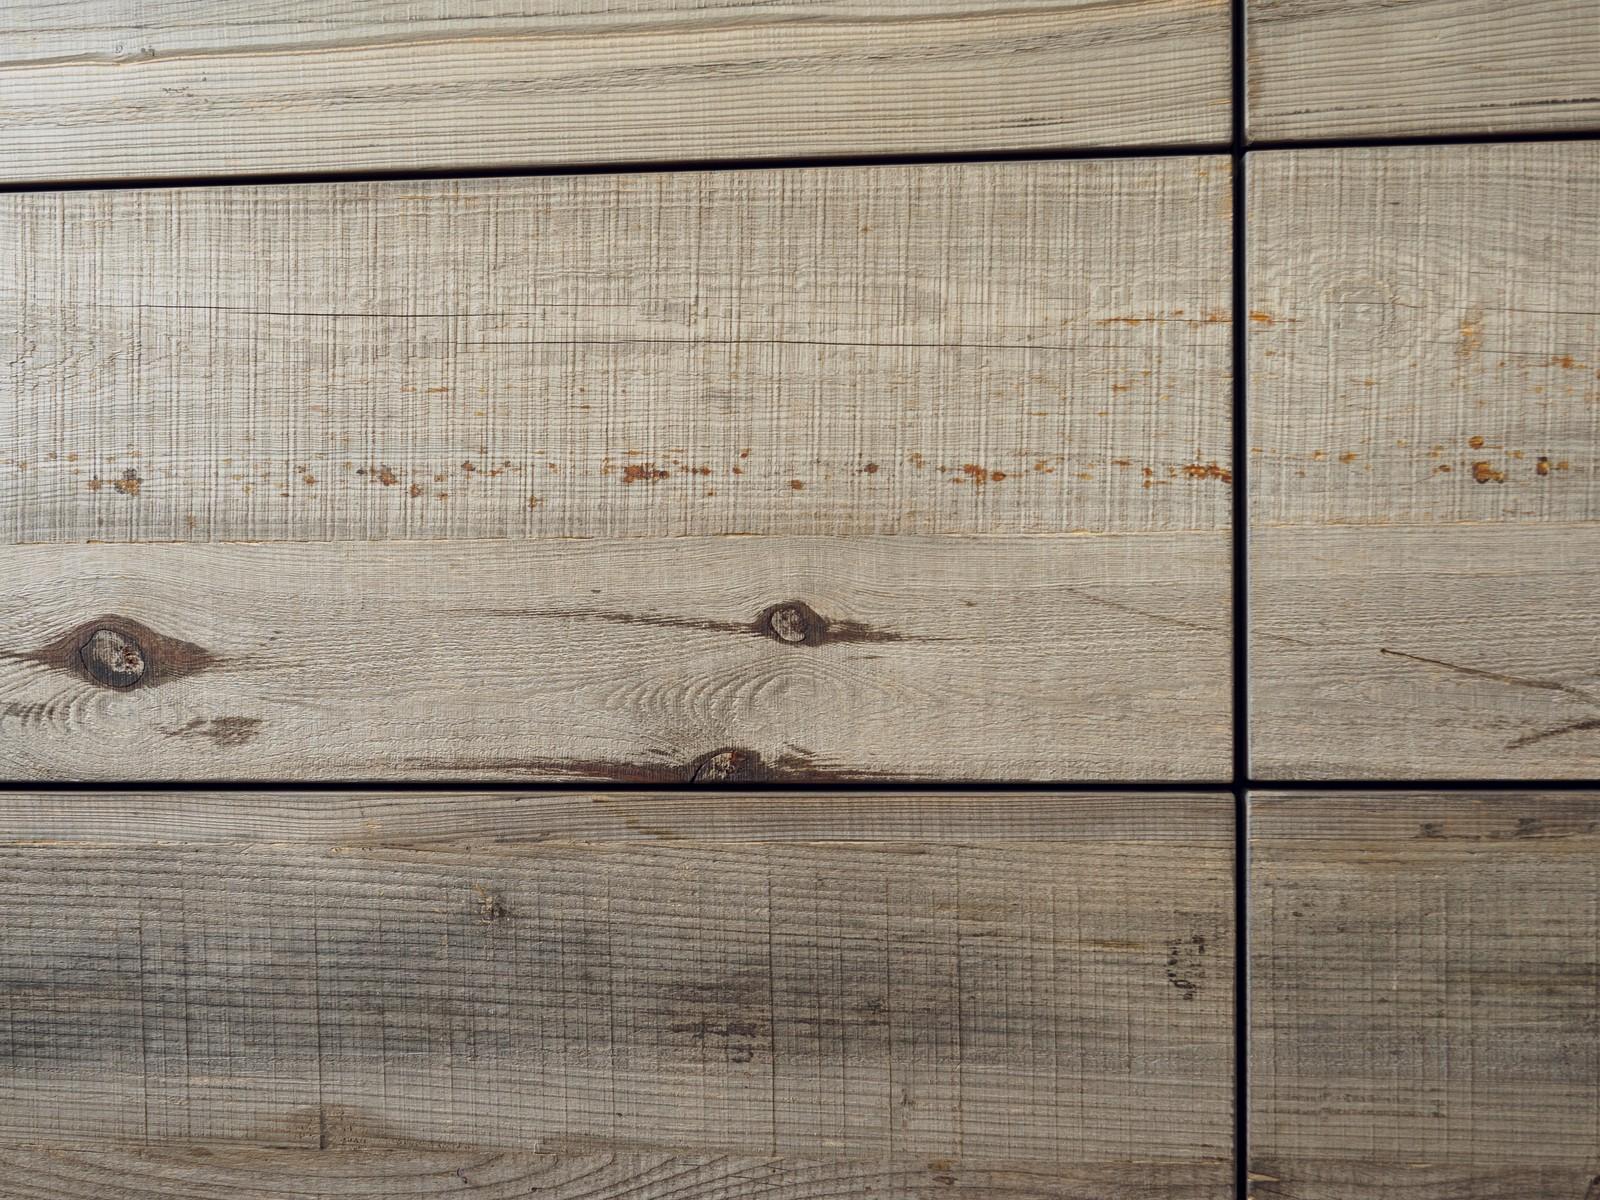 Kueche Exklusiv Design Fronten Holz Furnier Sonnenverbrannt Stahl Keramik Arbeitsplatte Miele 49